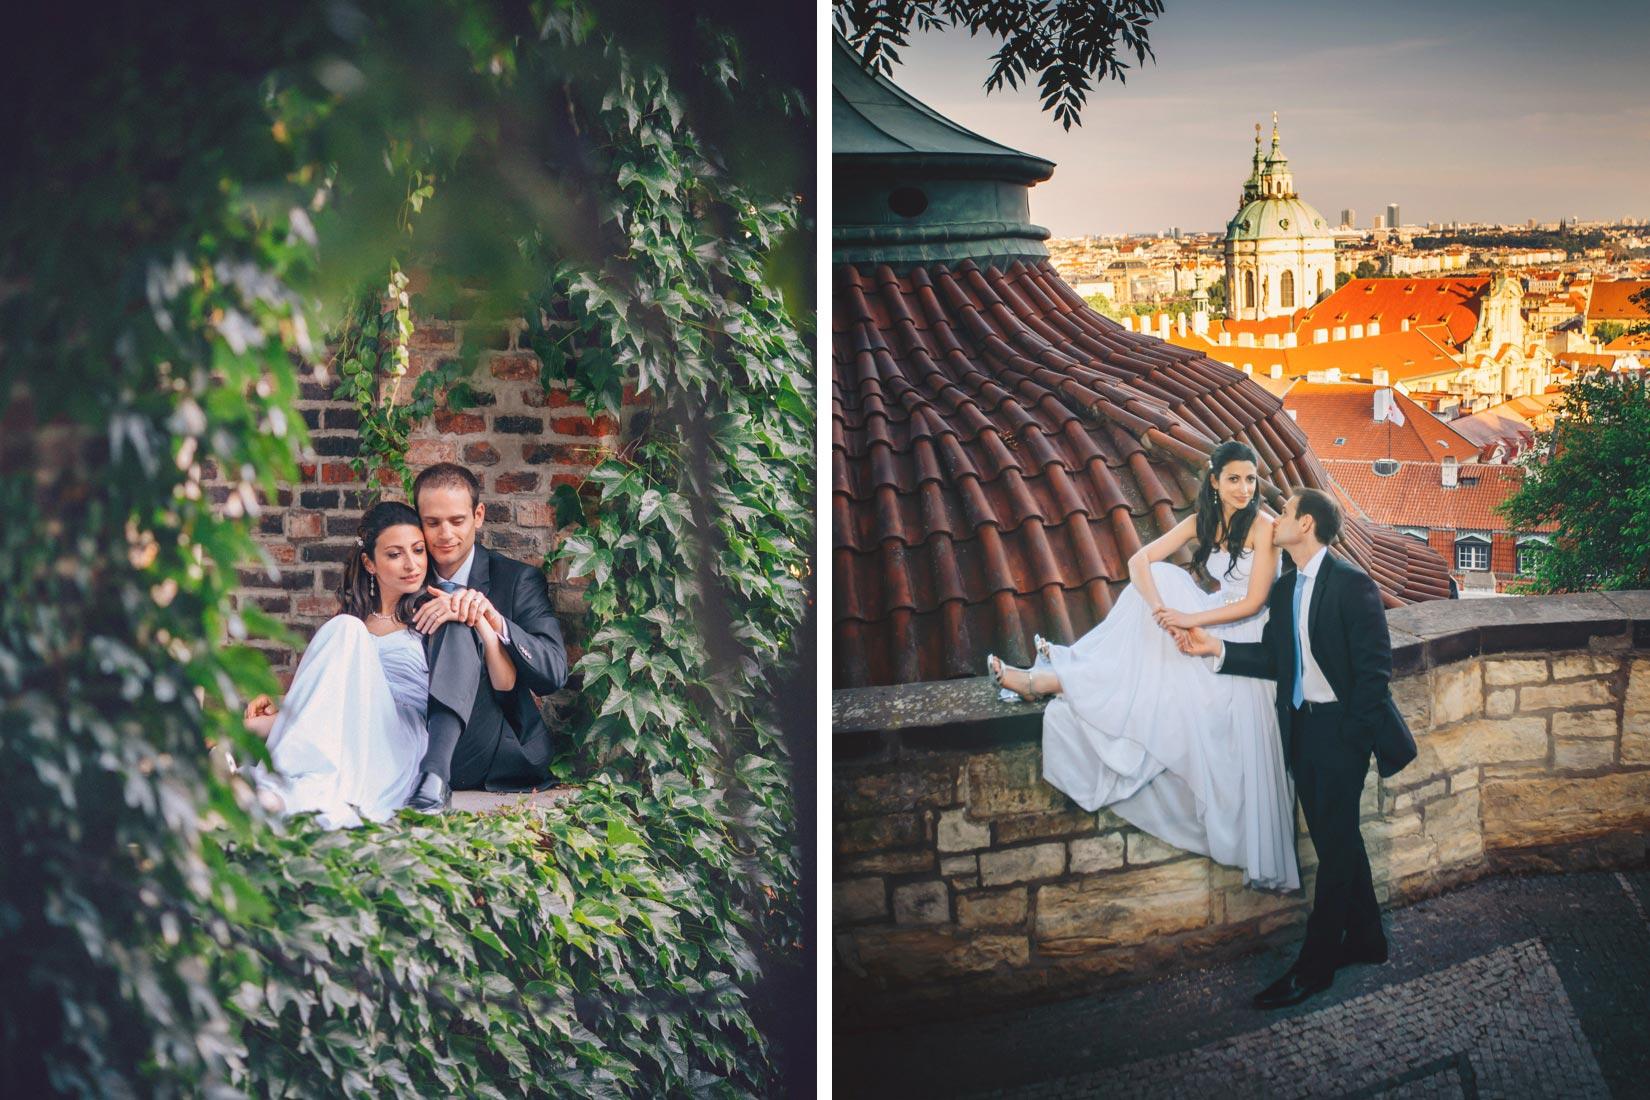 Prague photographers / Lana & Mike's Lifestyle Portrait session